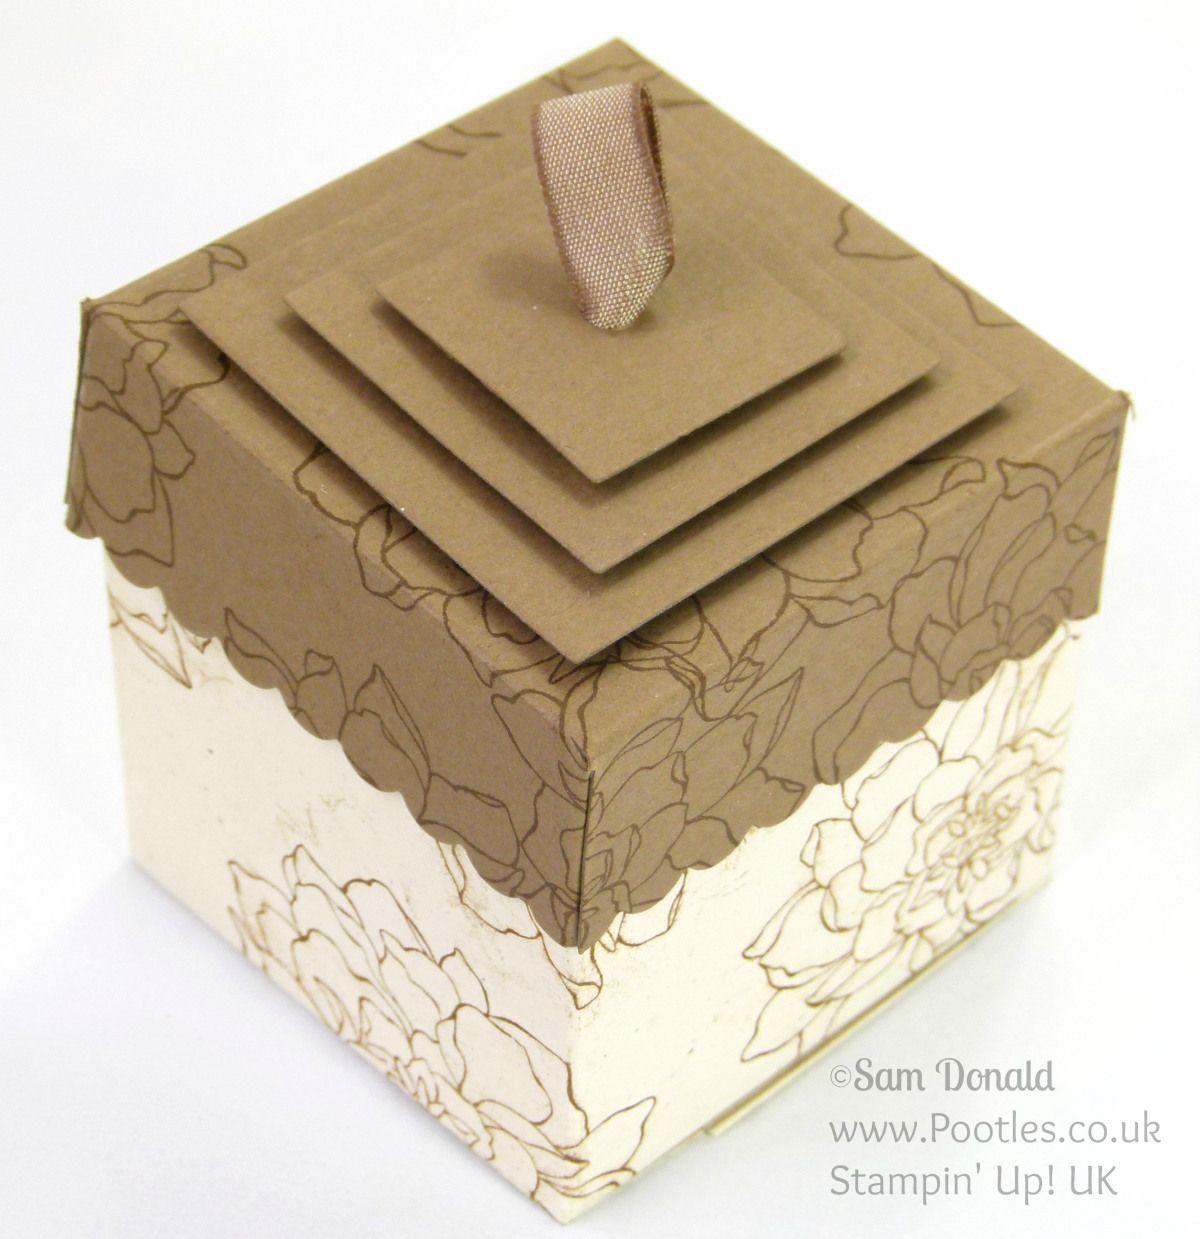 Lidded Box Tutorial using ©Stampin' Up! Squares Framelits